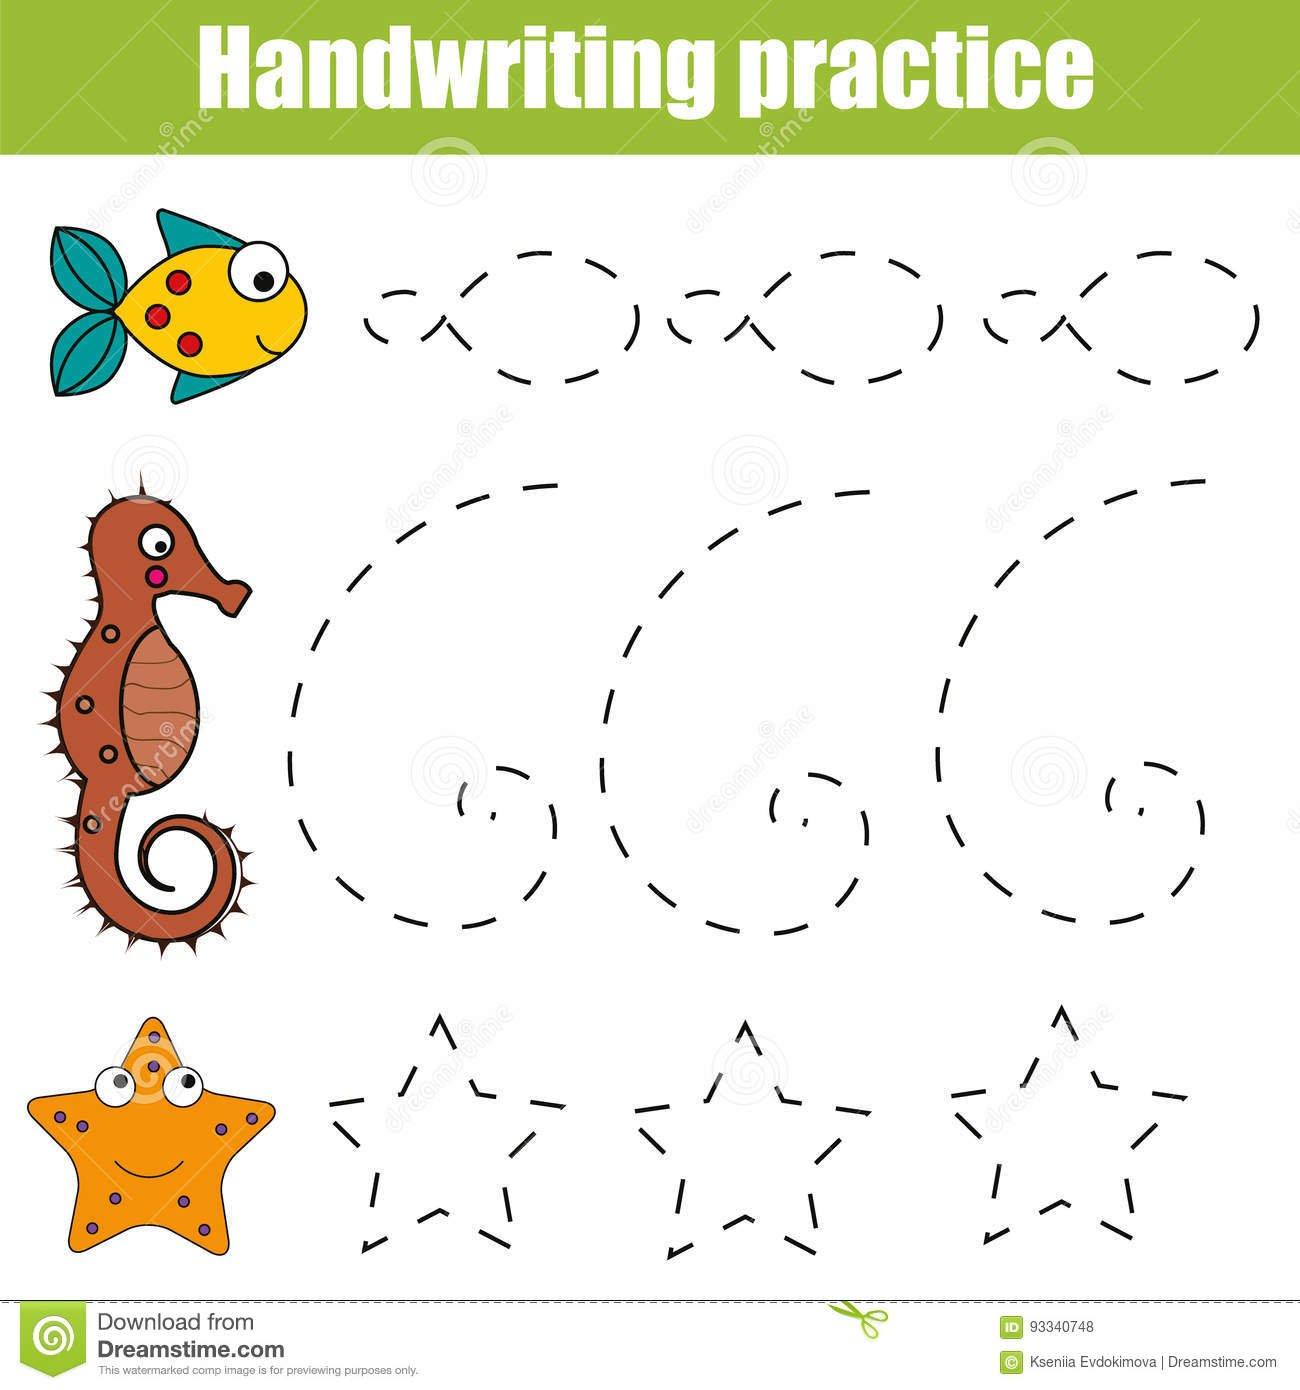 Handwriting Practice Sheet Educational Children Game Printable Along With Los Animales Printable Worksheets